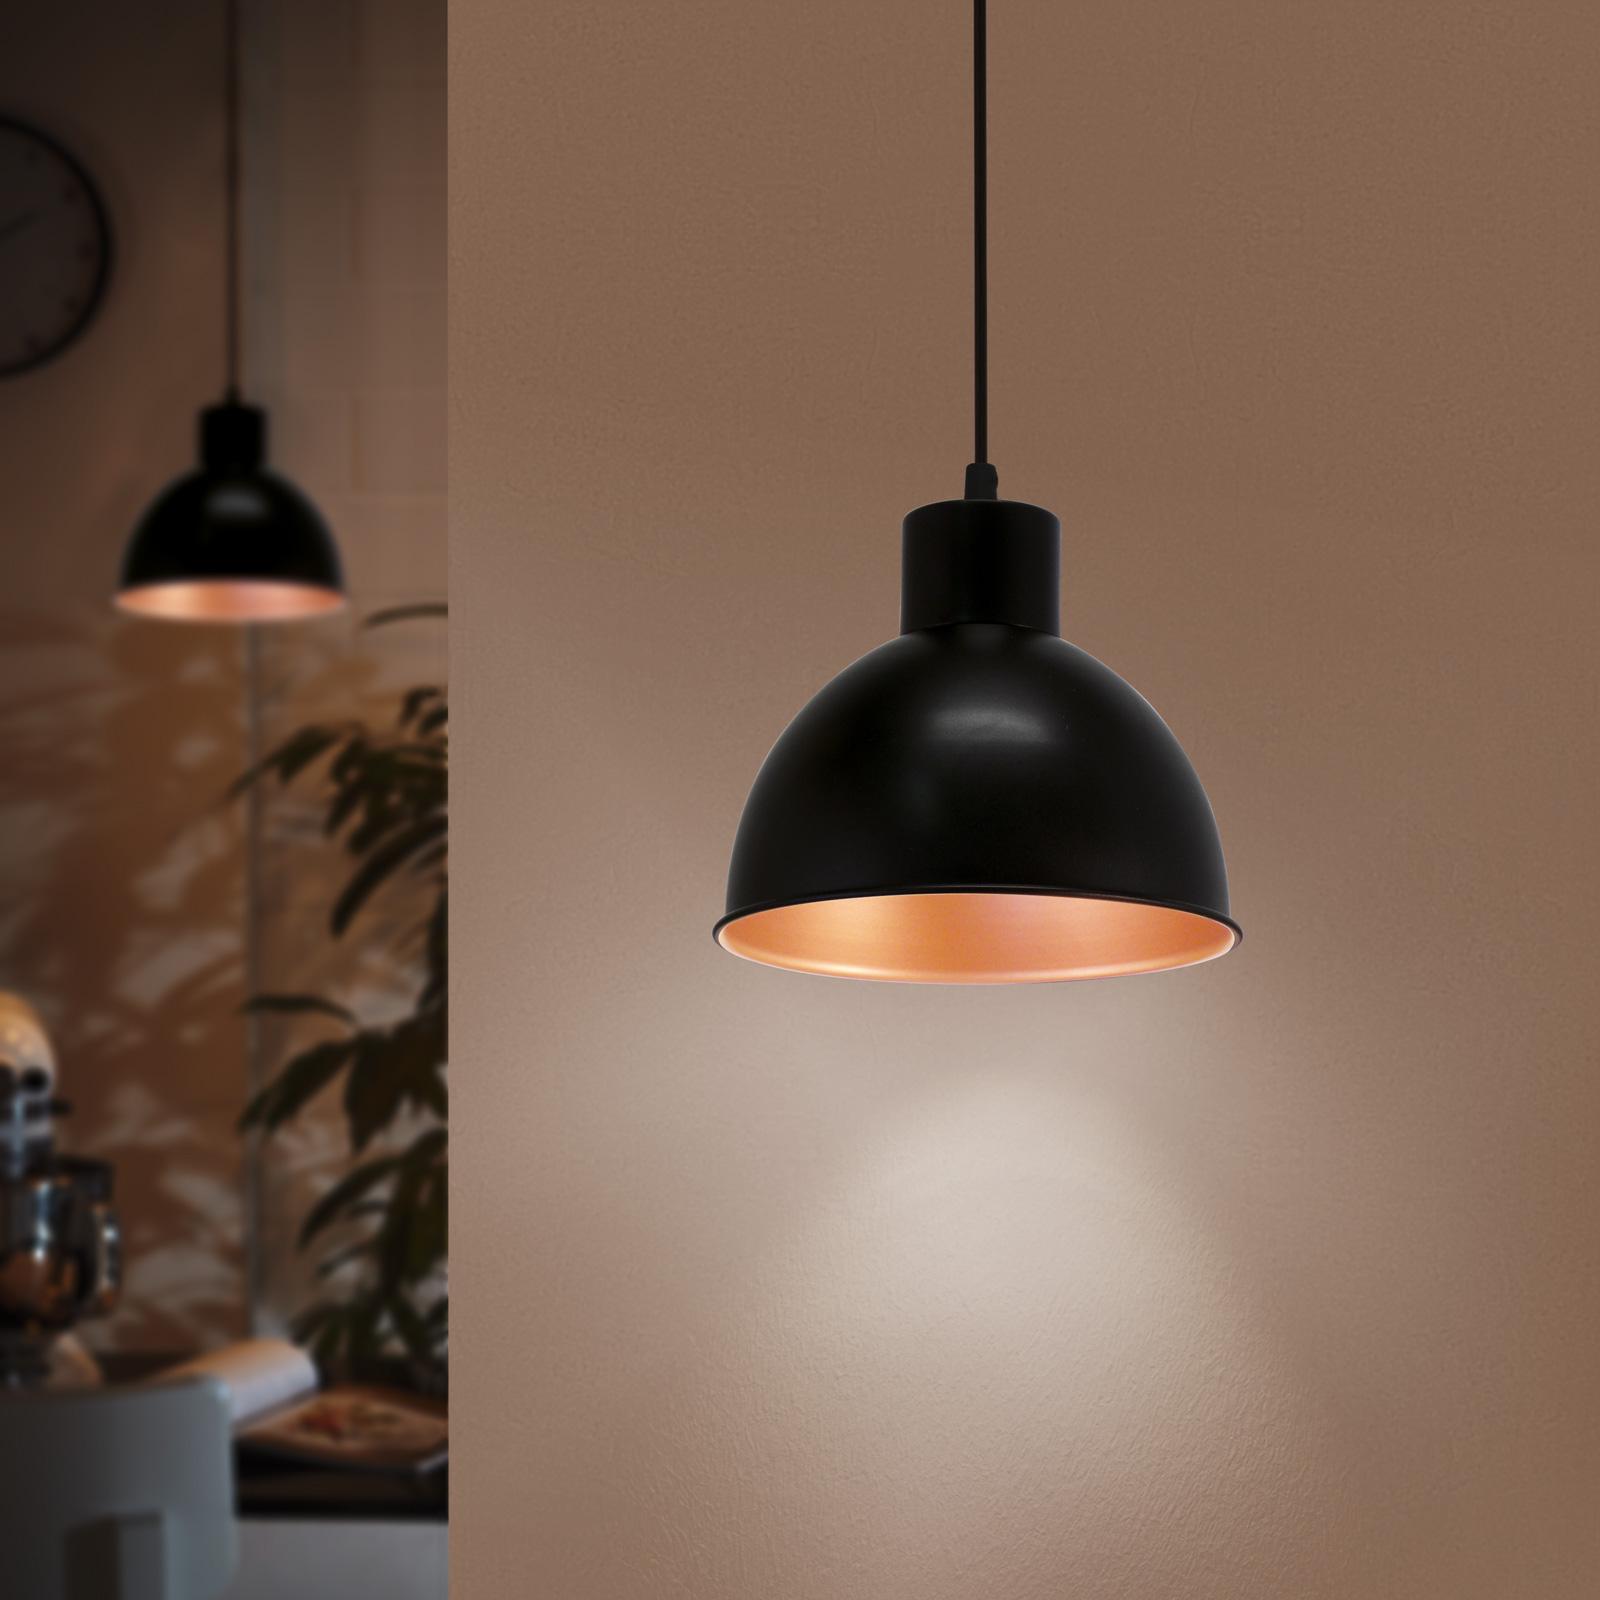 Svart hengelampe Andrin innvendig kobber | Lampegiganten.no